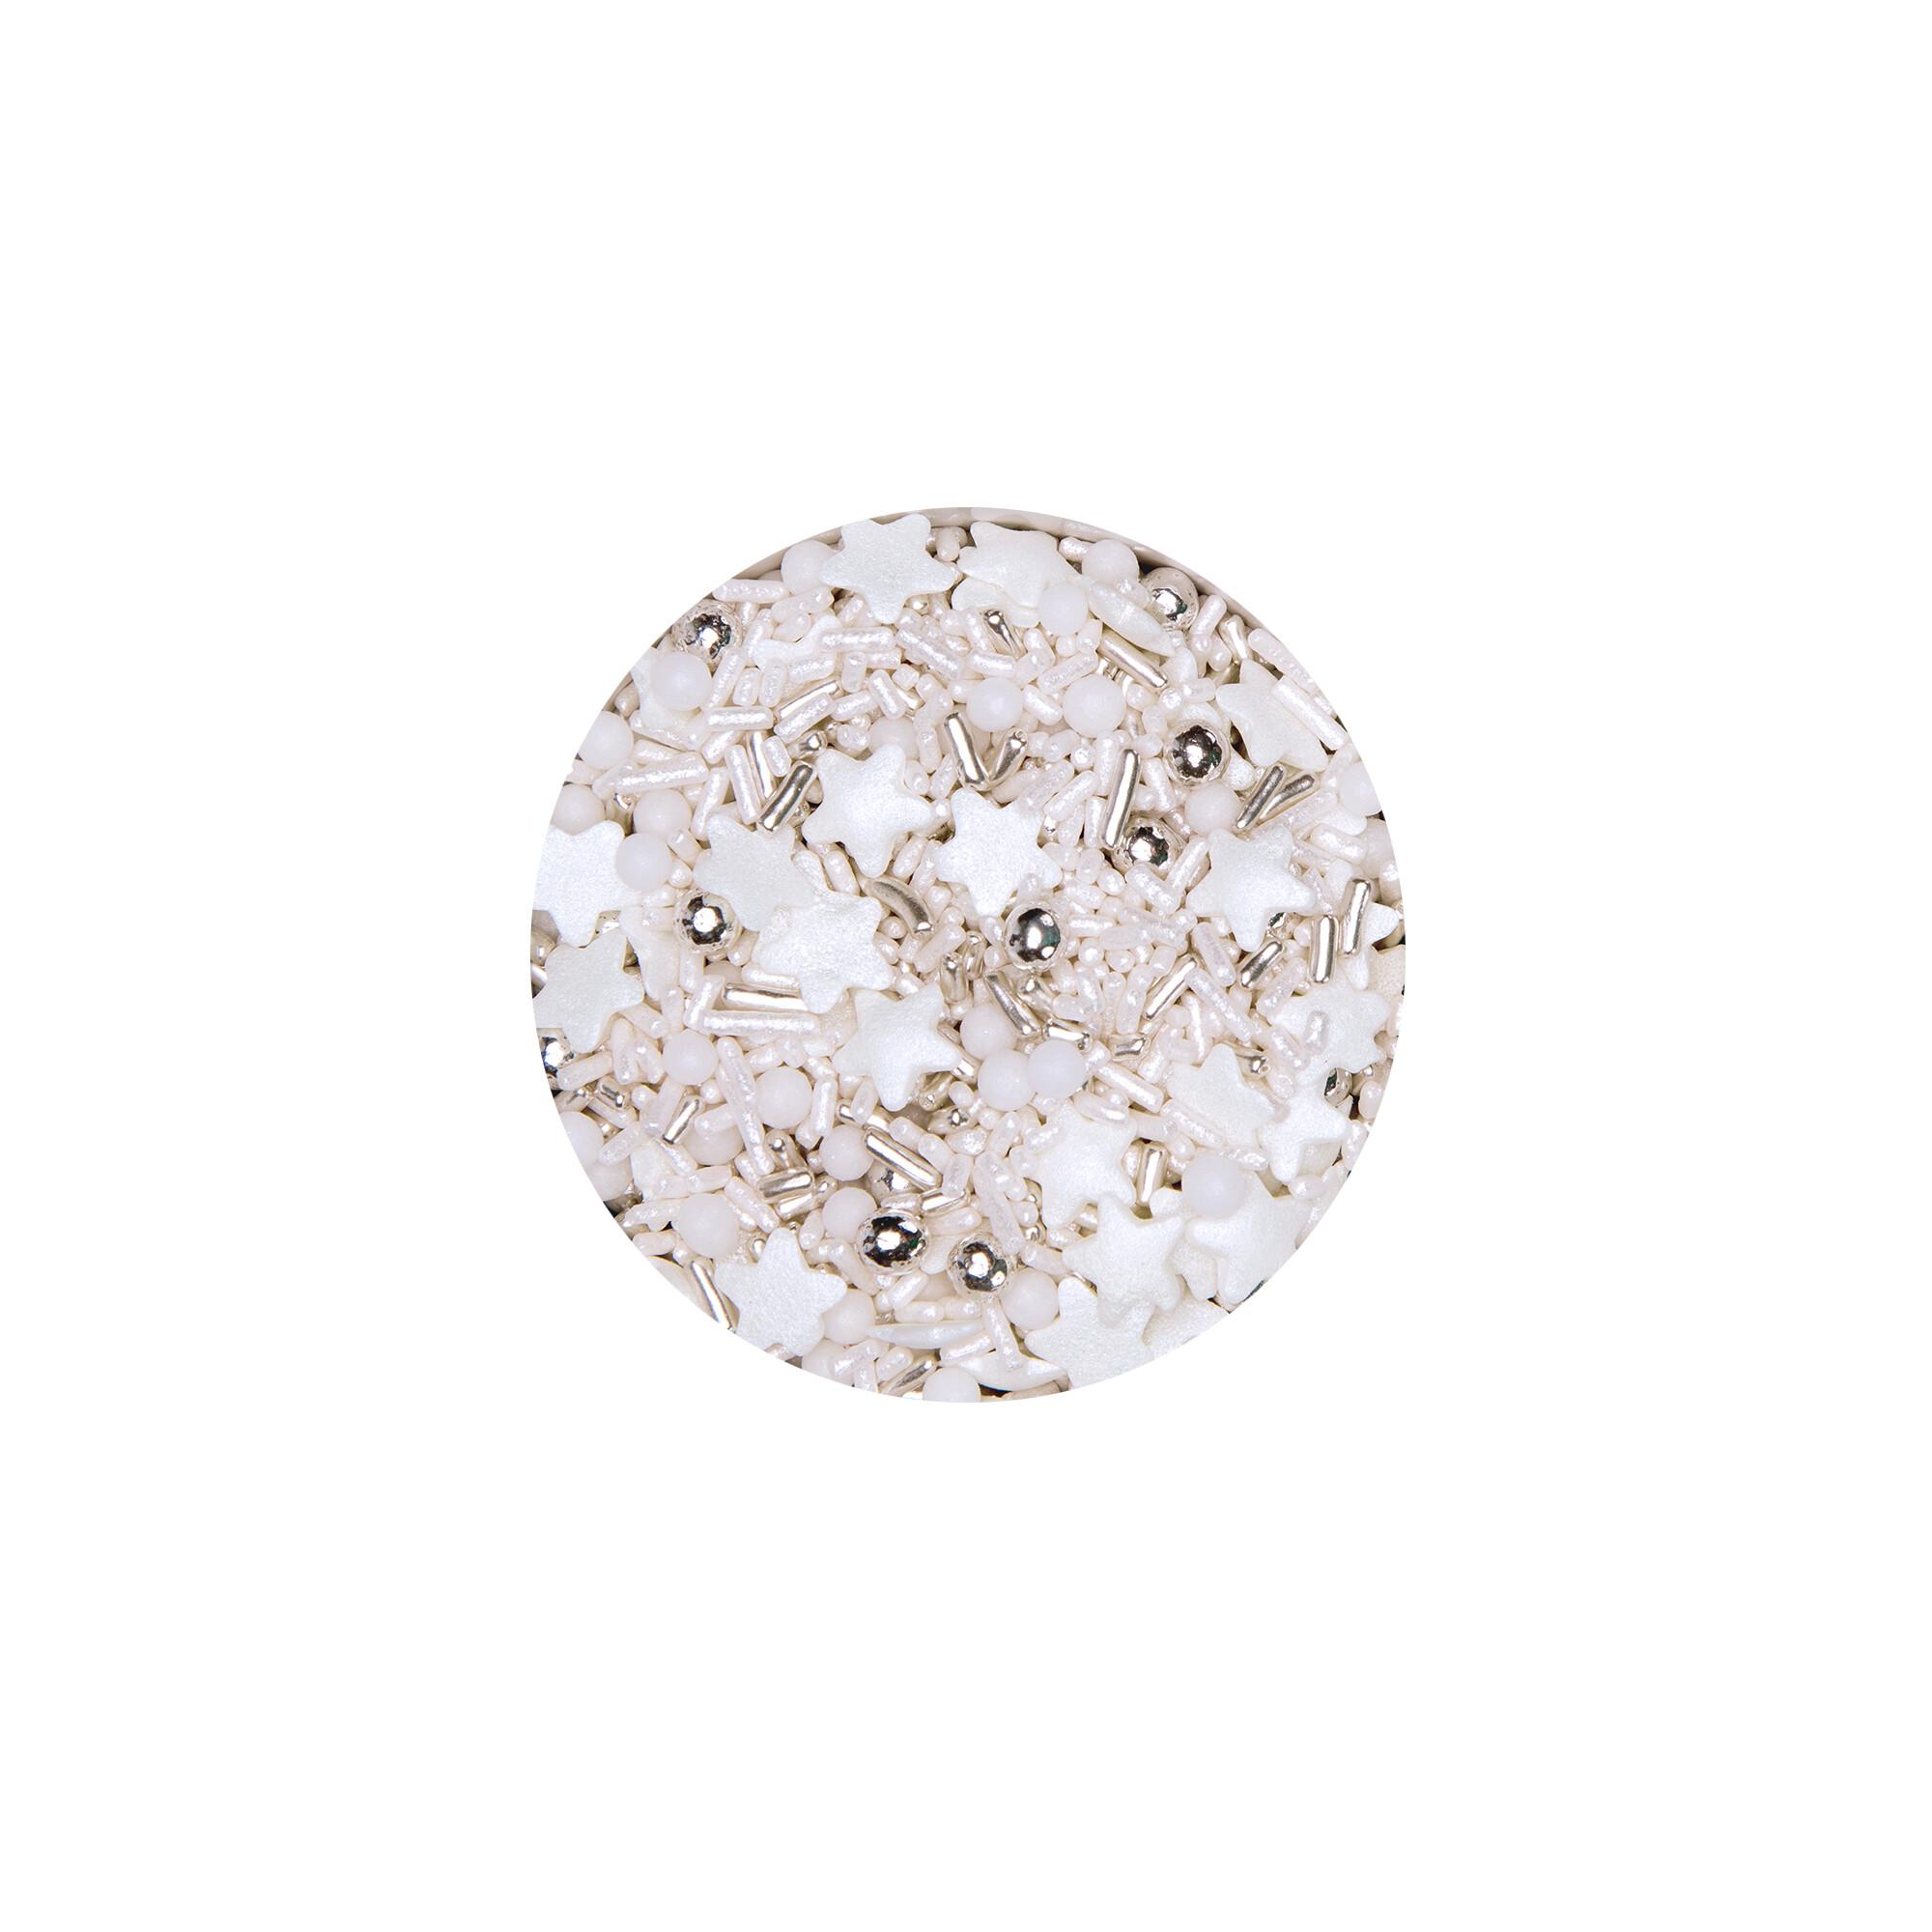 Edible sprinkle decoration - Magic stars - Mix